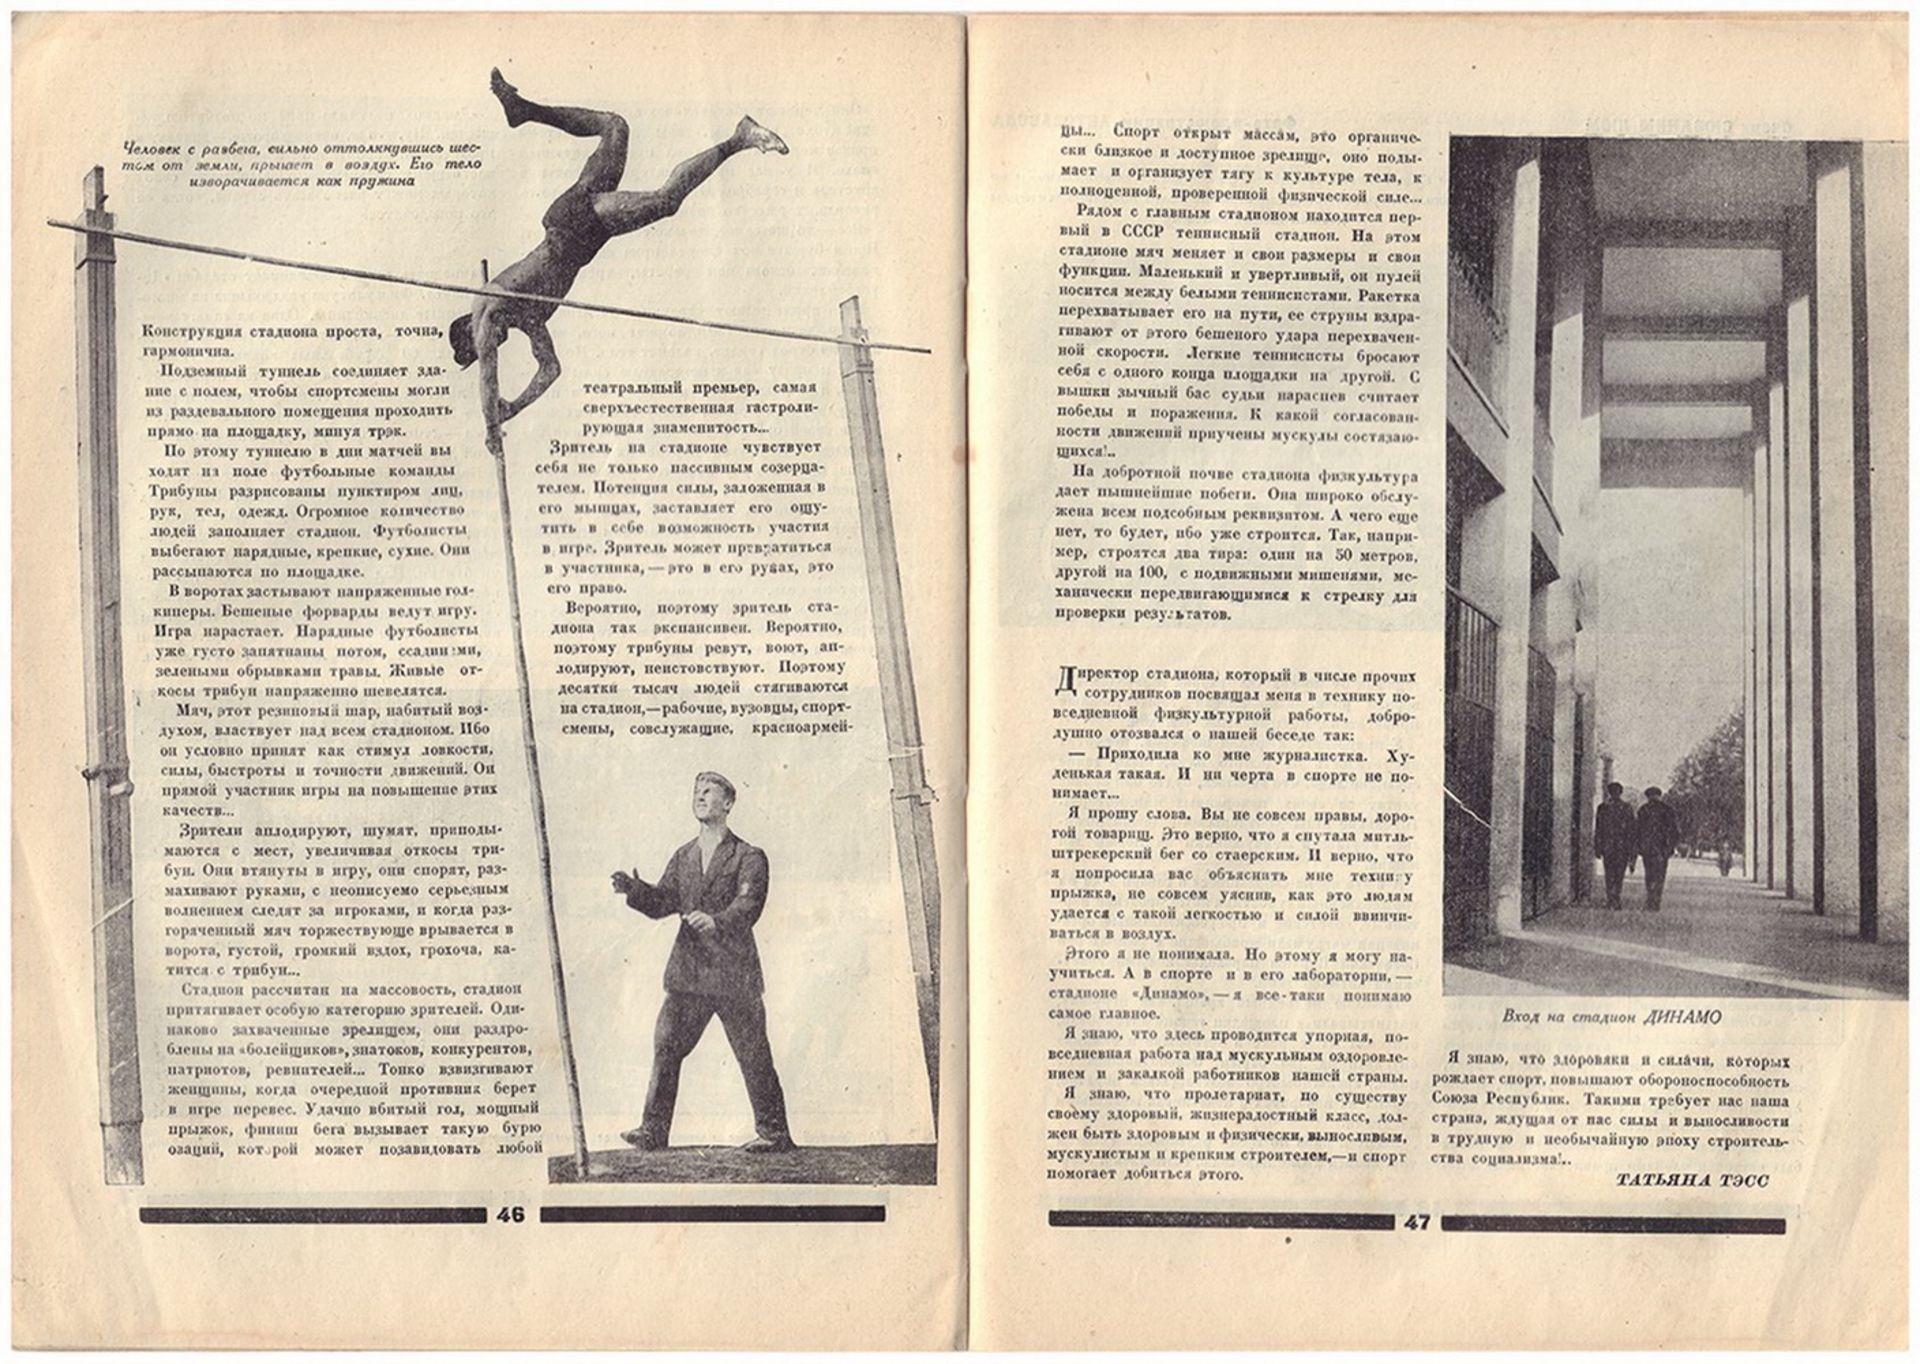 [Pimenov, Yuri. Design. Soviet art]. 30 days: Magazine. Issue 8th. - Moscow, 1930. - [1], 93, [4] pp - Bild 3 aus 3